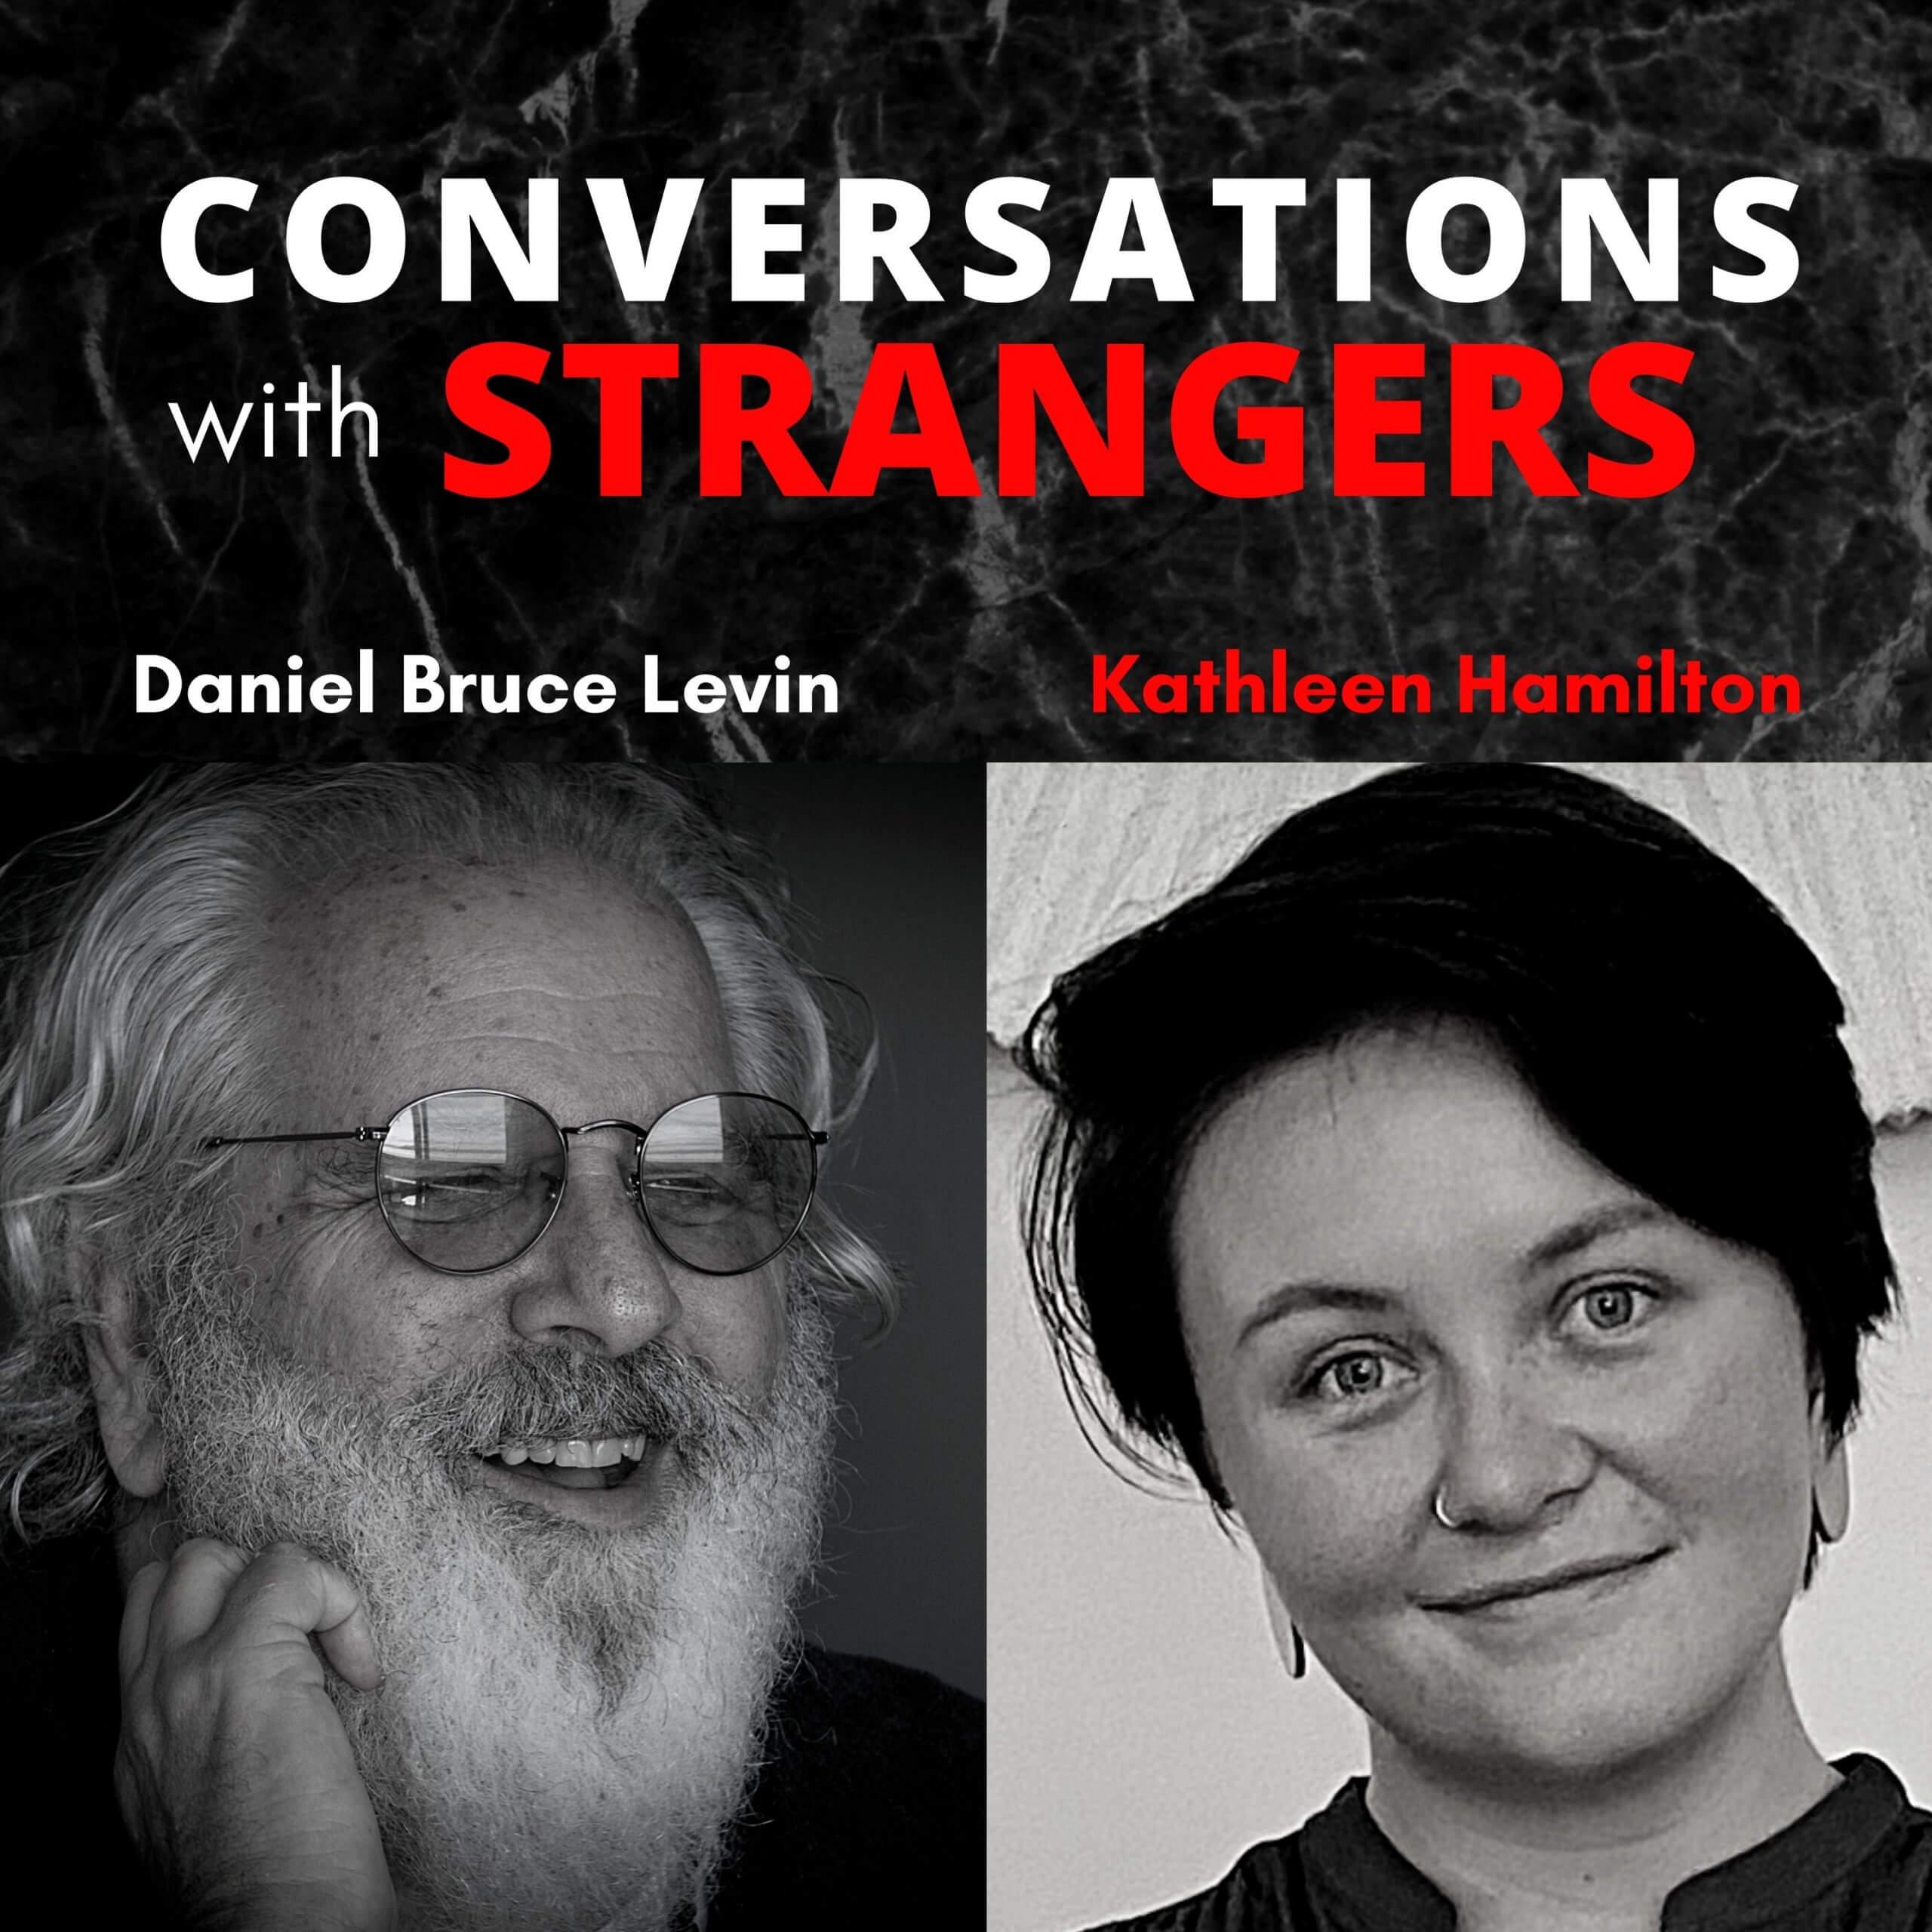 Conversations with Strangers feat. Kathleen Hamilton